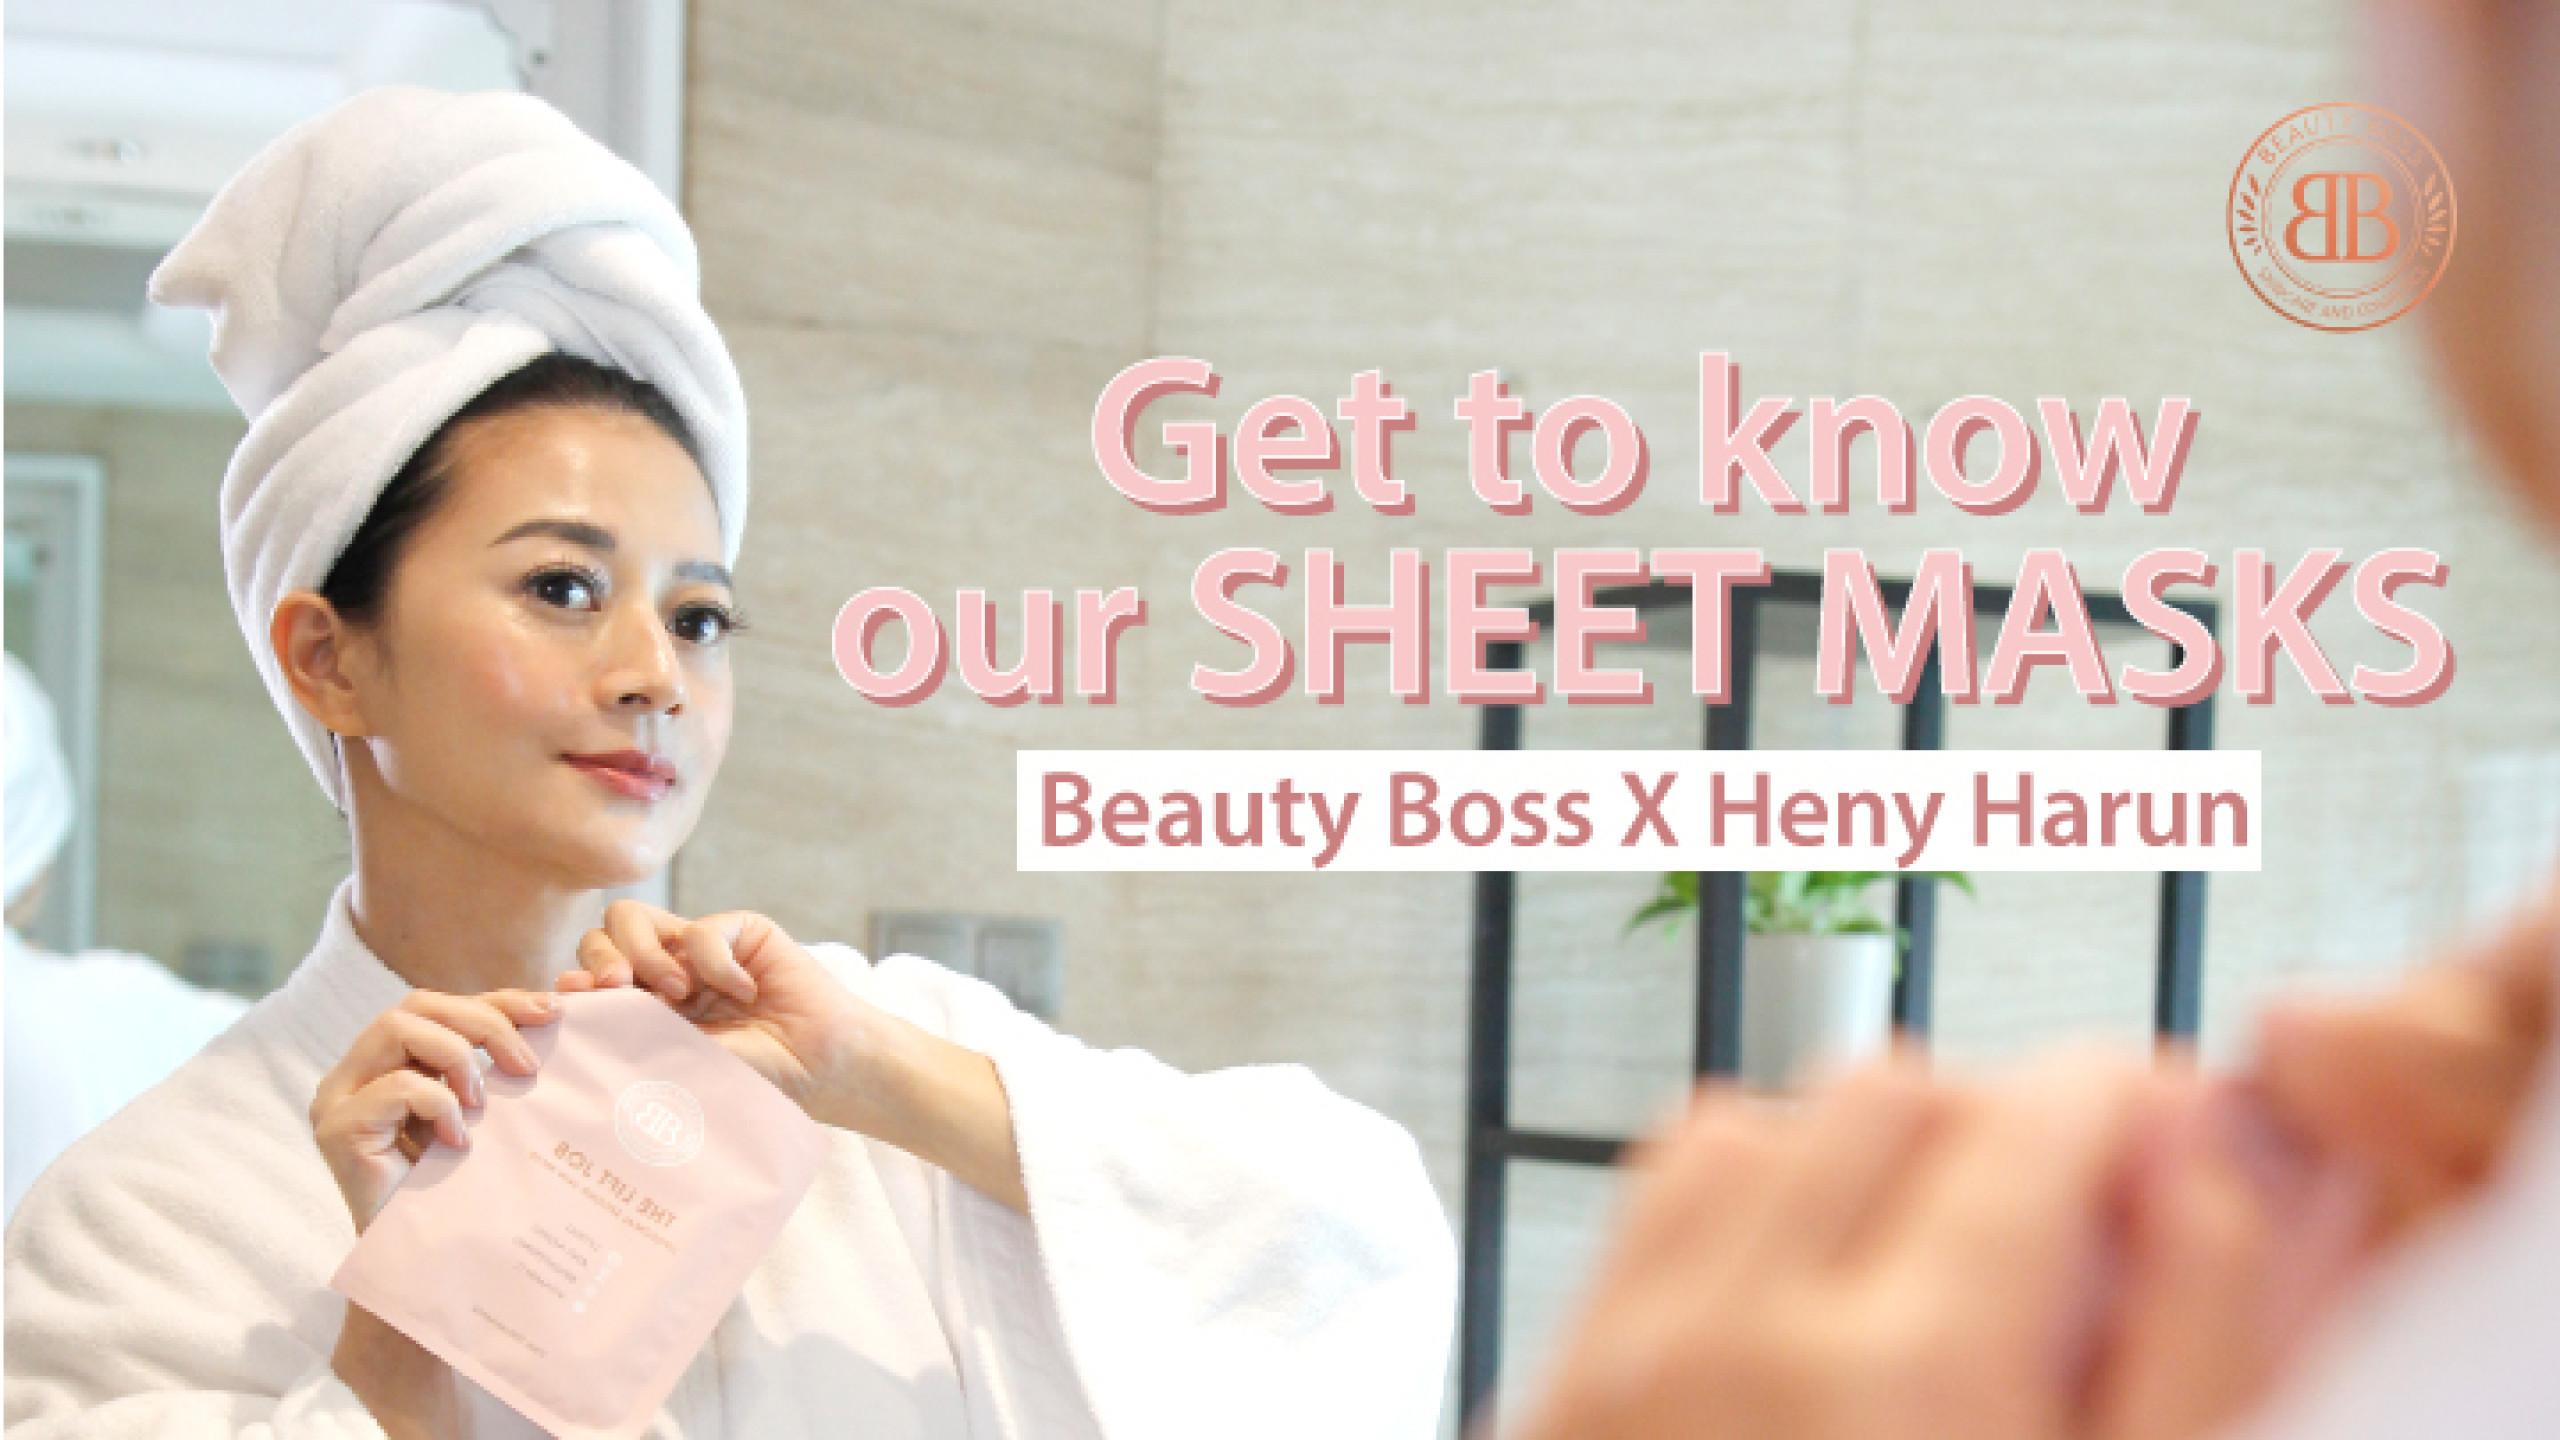 Beautyboss X Heny Harun